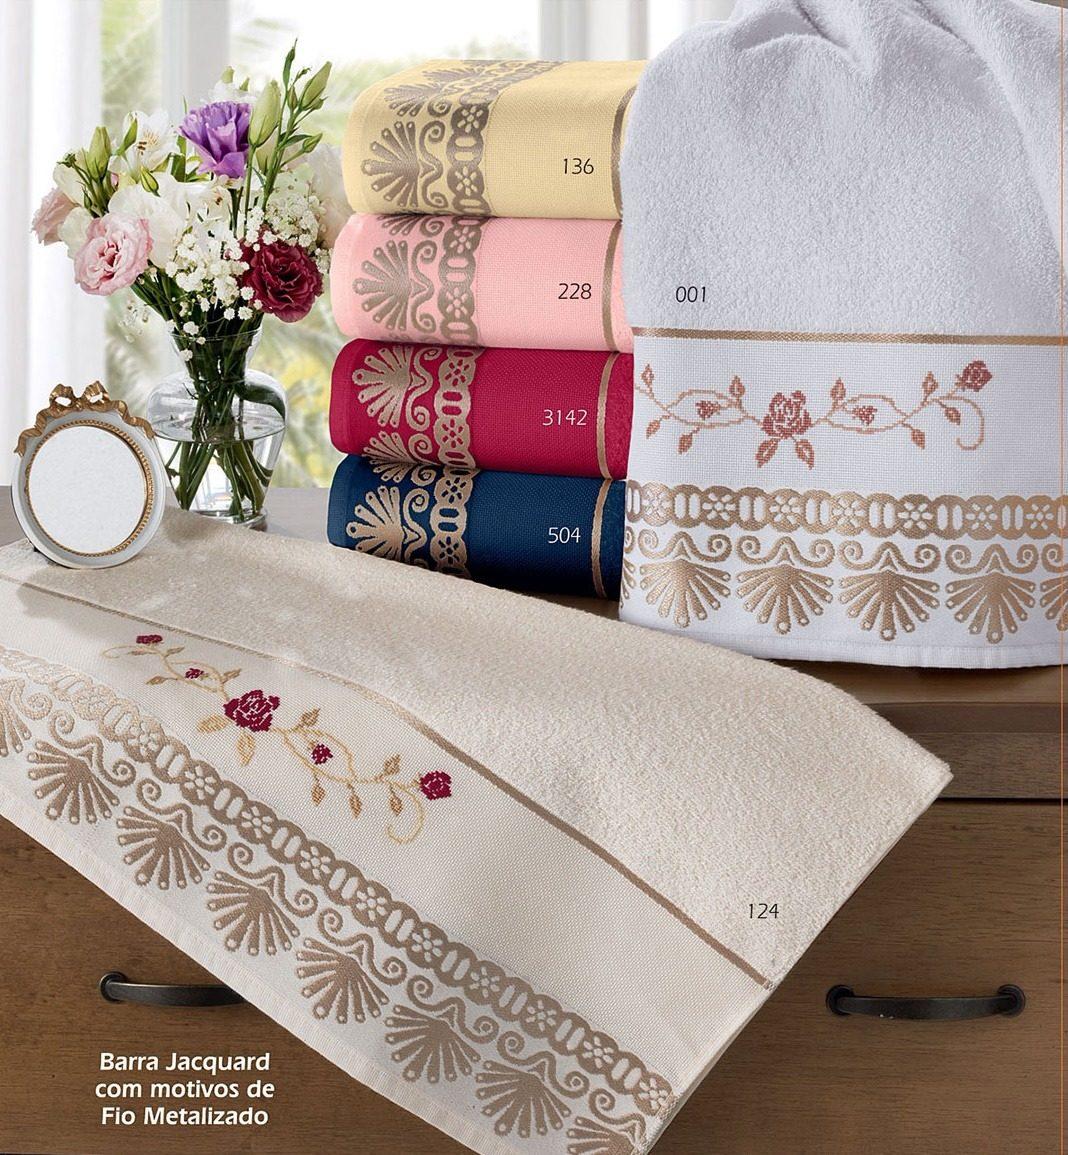 f885fd34ab toalha felpuda barra jacquard p bordar kit 03 banho 03 rosto. Carregando  zoom.